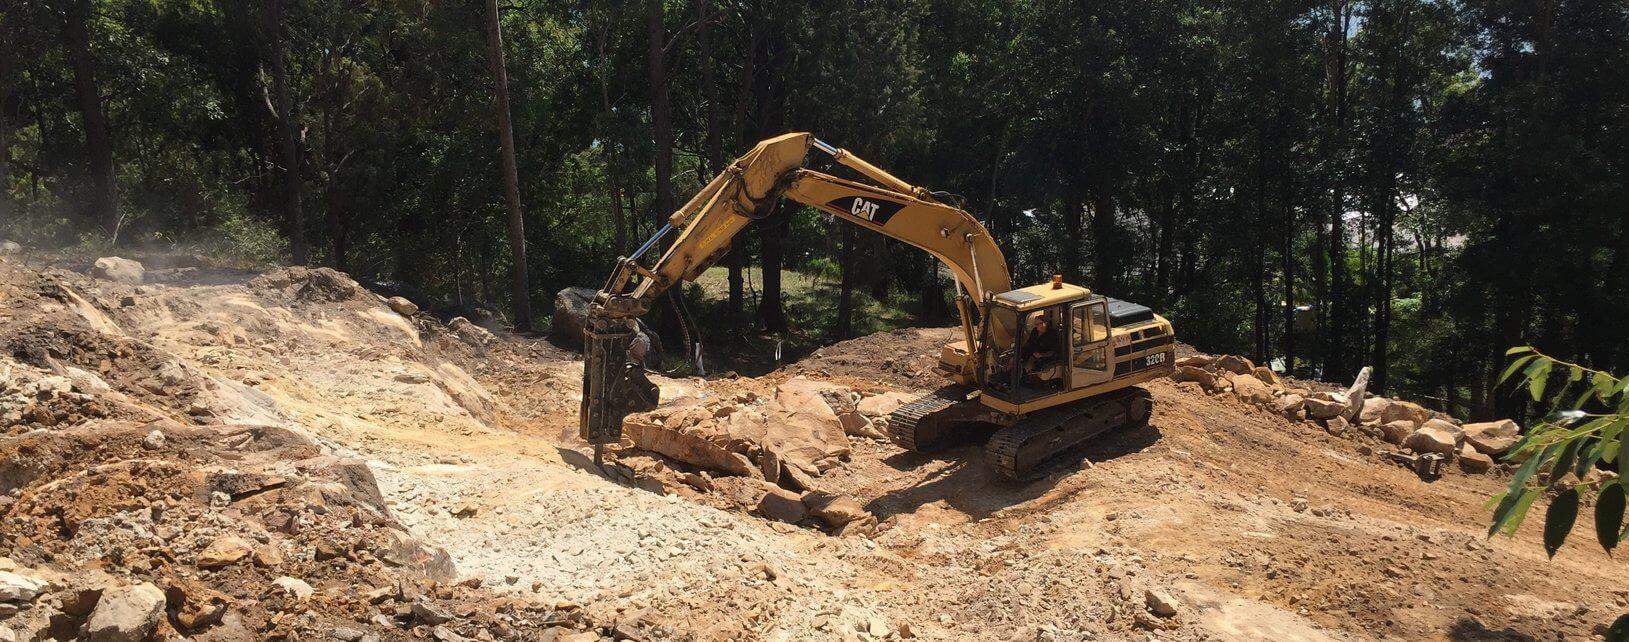 Rock Excavation - Blueprint Built